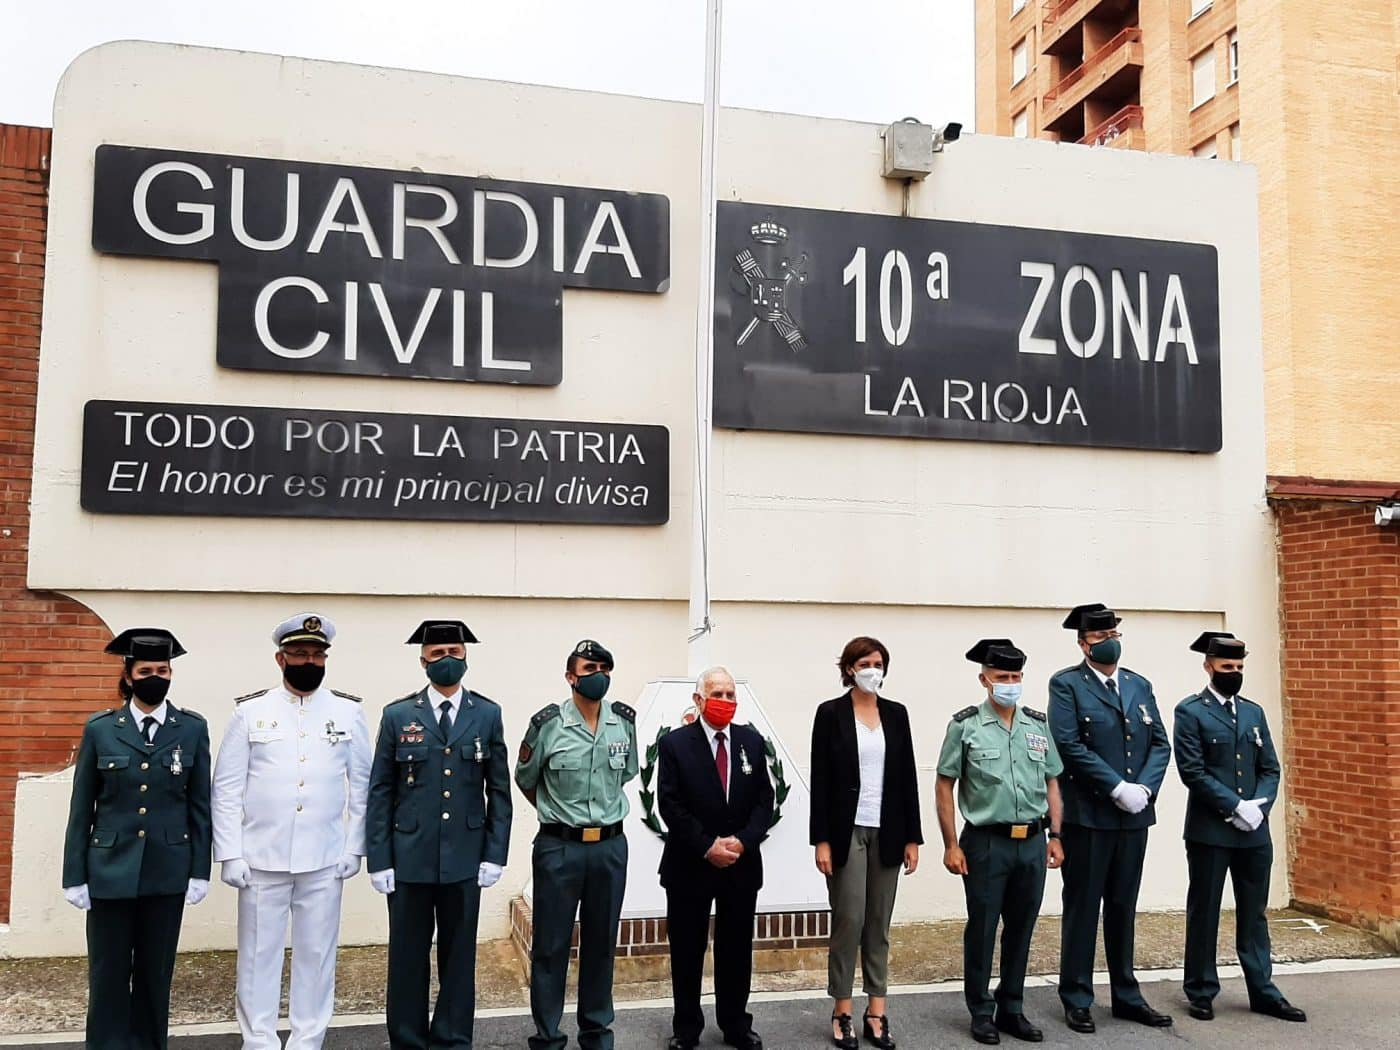 La Guardia Civil condecora a Fernando Reinares, presidente de Cruz Roja en La Rioja 3